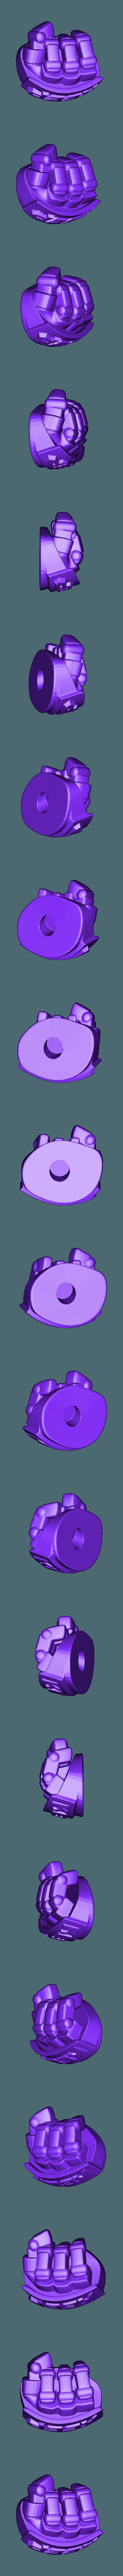 gorilla_tron_hand.R.stl Download free STL file G - TRON • 3D printable model, TheTNR